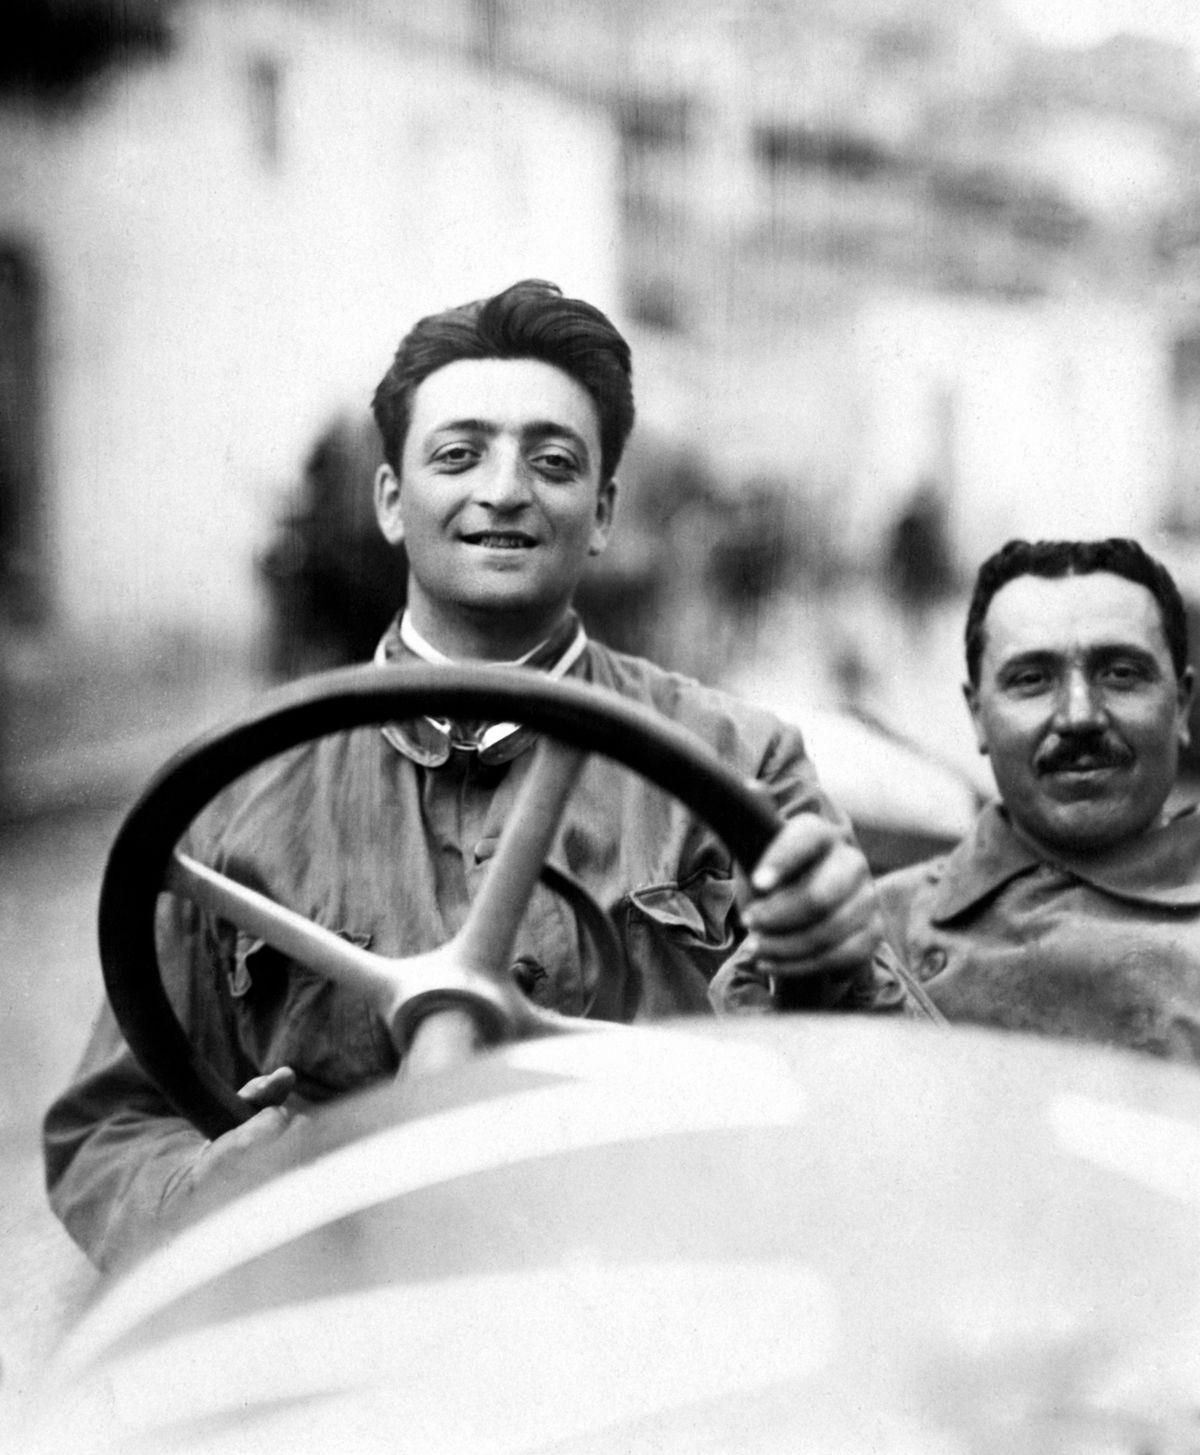 9. Enzo Ferrari at the Targa Florio in 1920. - The car is an Alfa Romeo 40-60 HP Racing Type